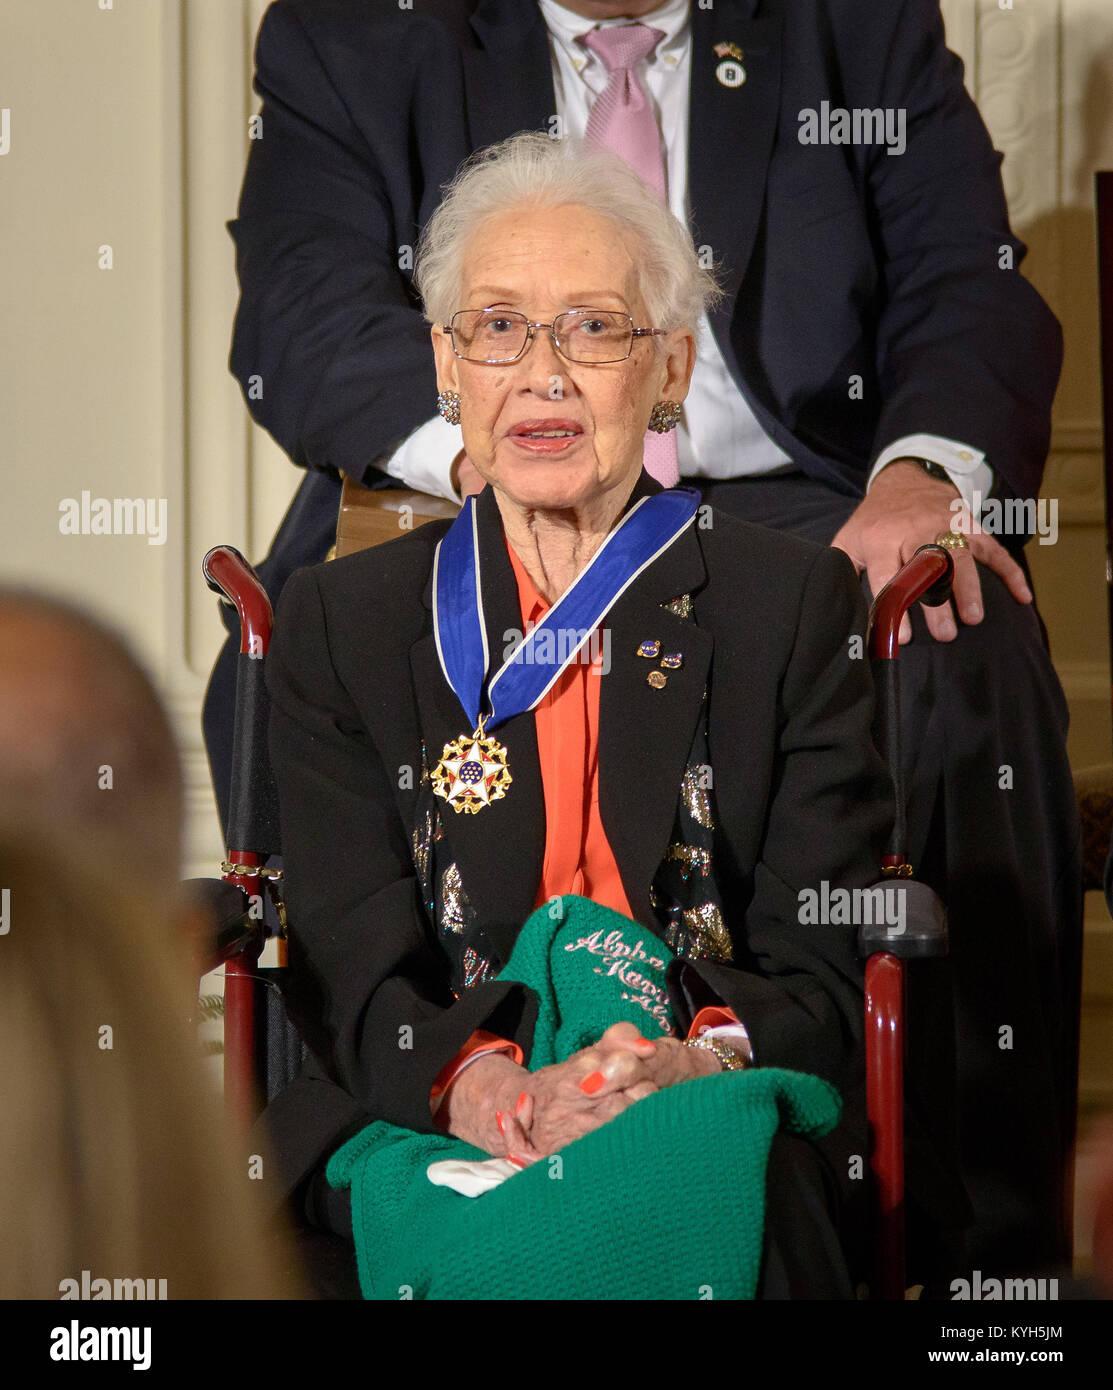 Ehemalige NASA-mathematiker Katherine Johnson empfangen die Presidential Medal of Freedom Stockfoto